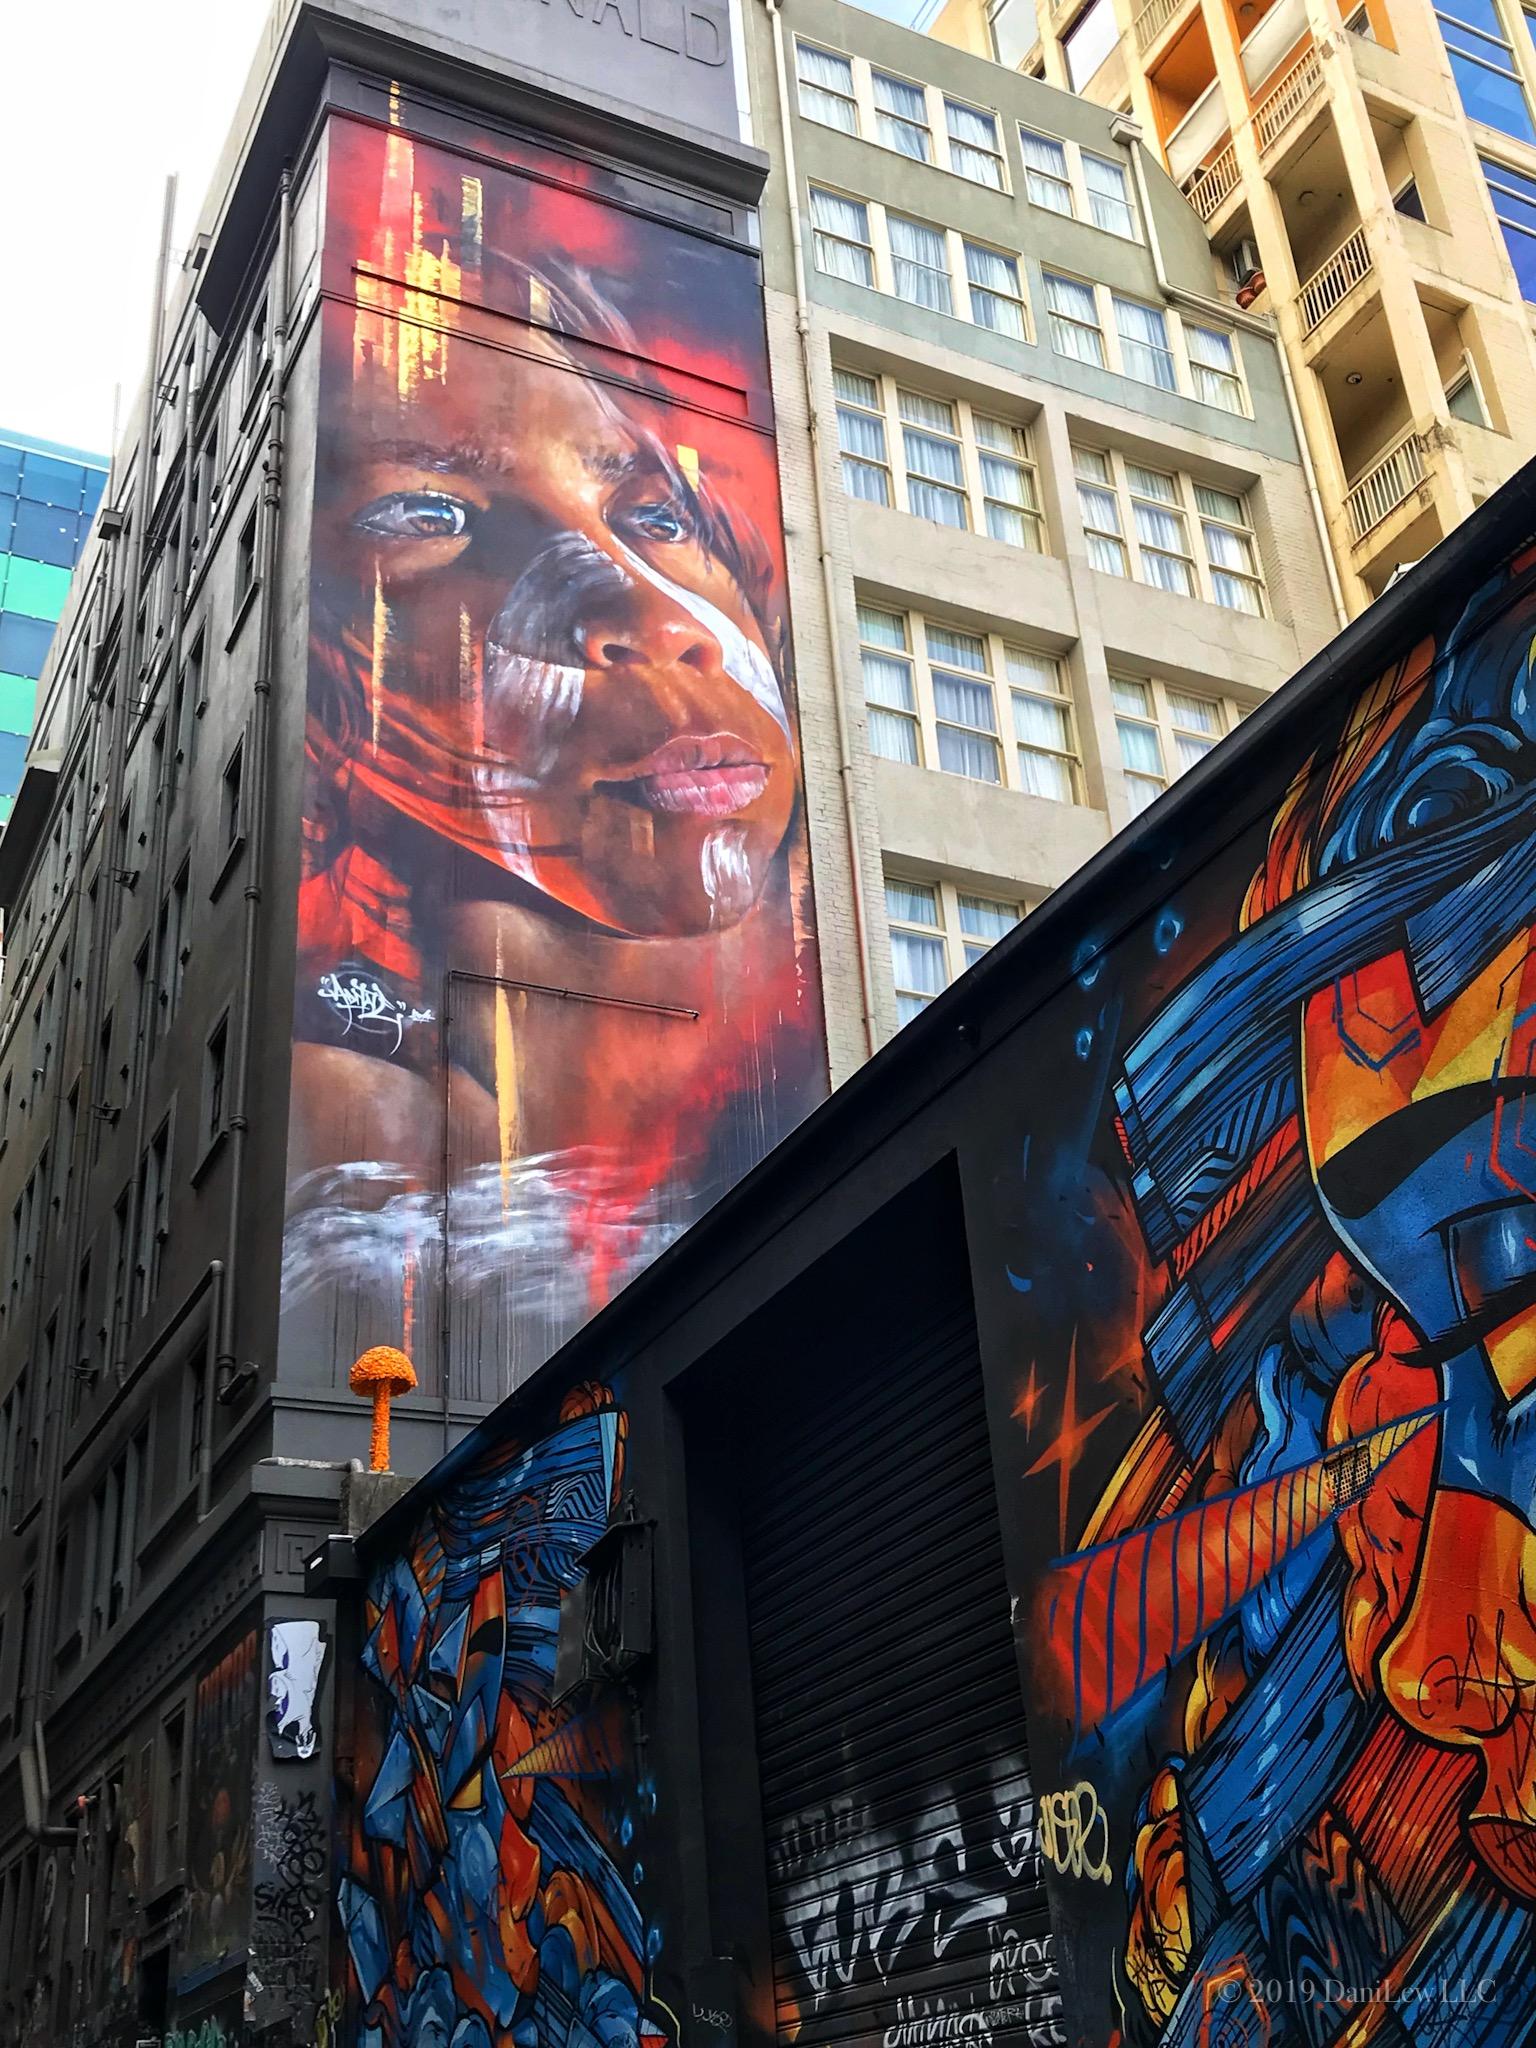 Hosier Lane Street Art - image taken with an iPhone 7